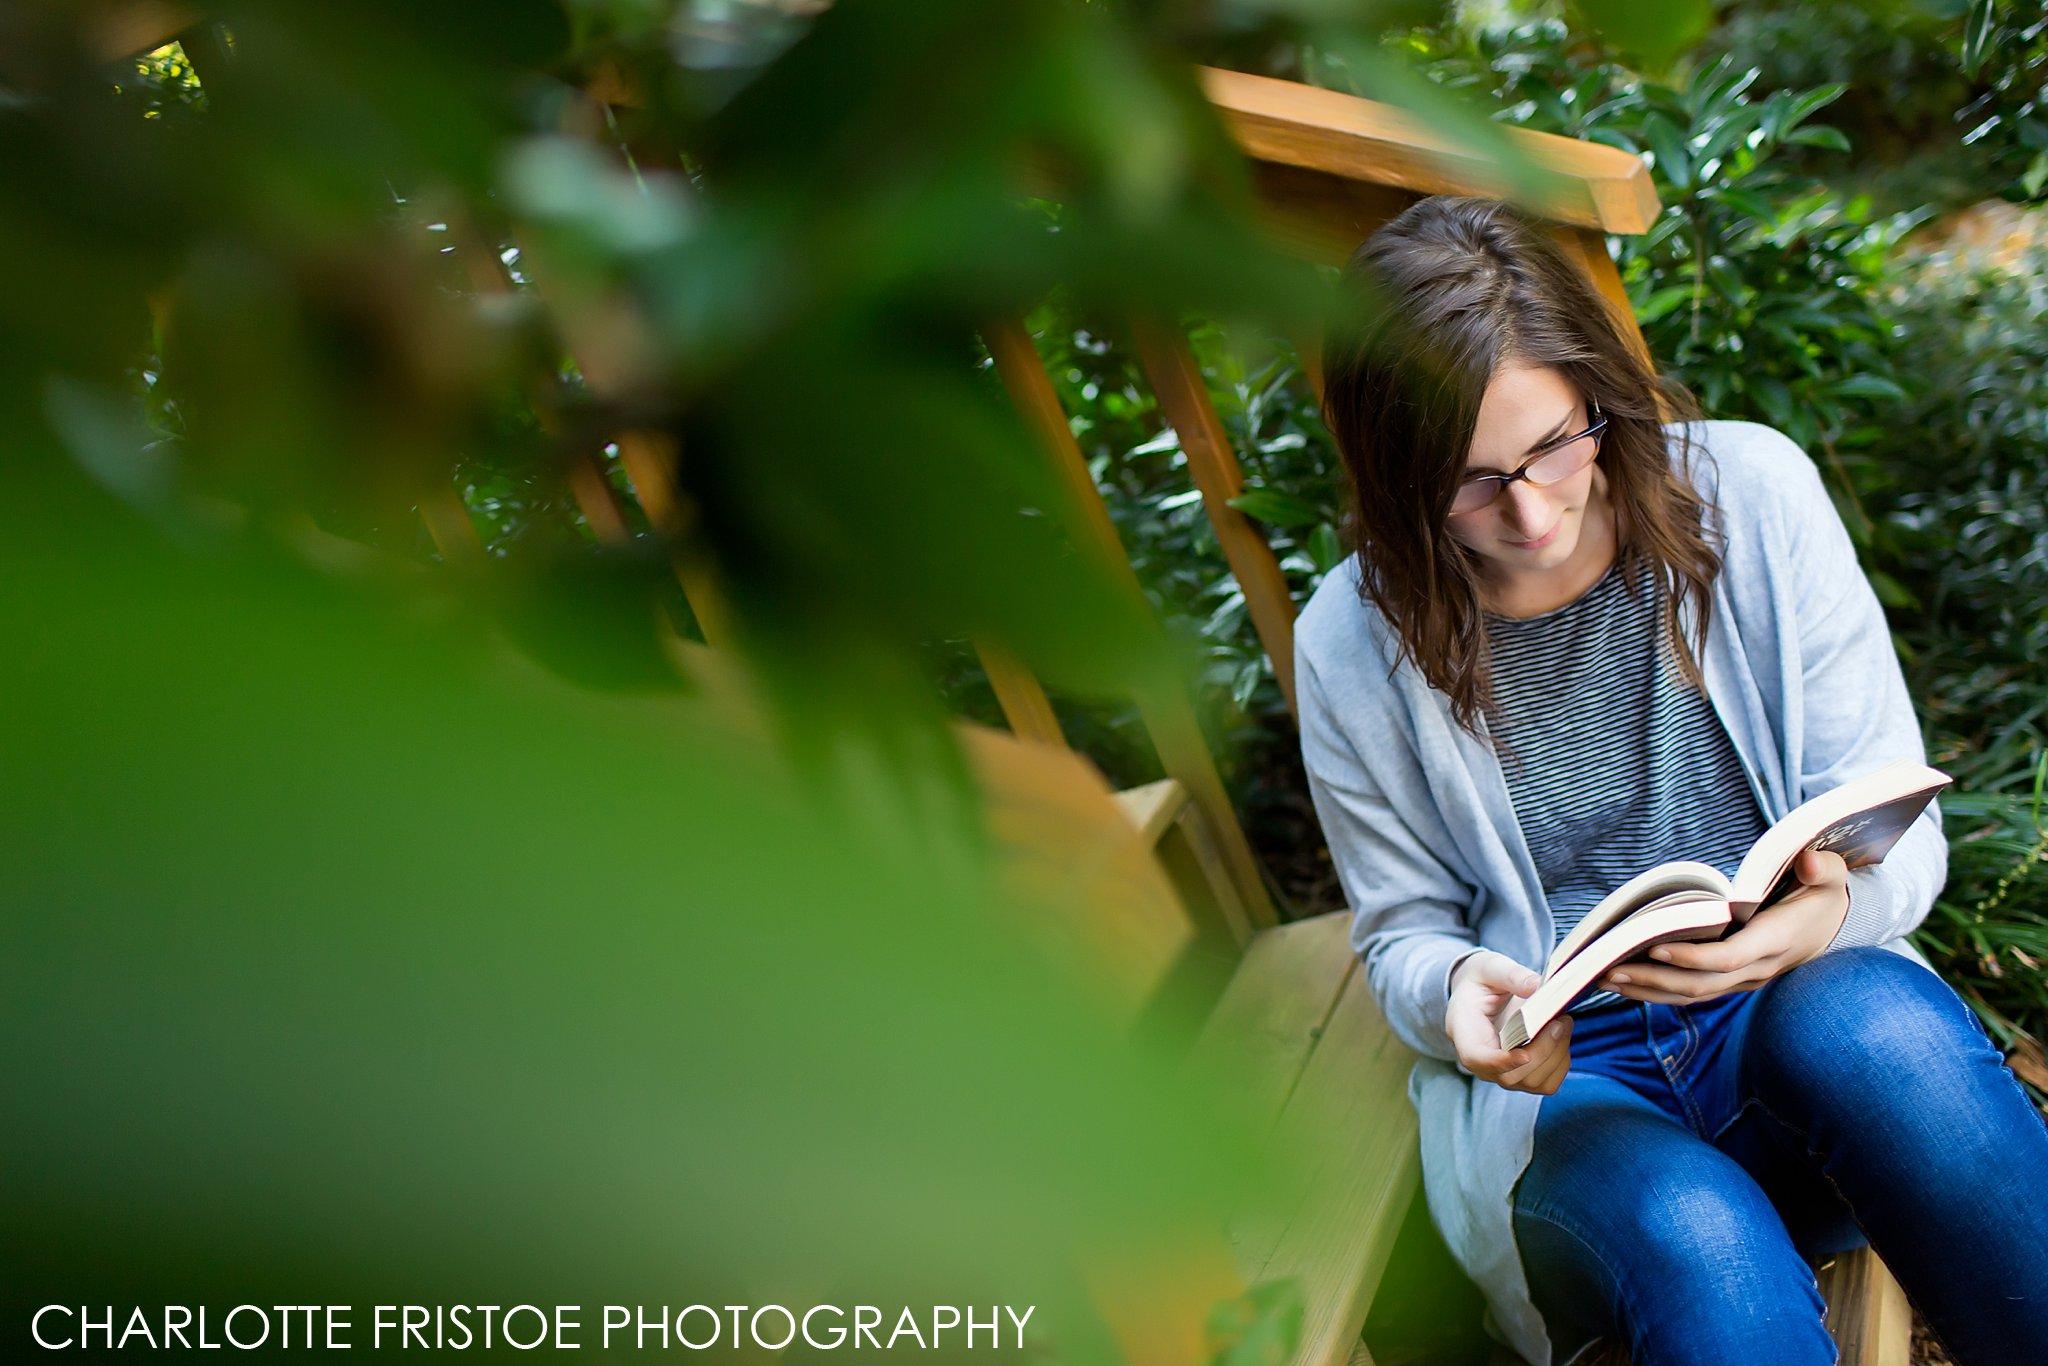 Charlotte Fristoe Photography Senior Pictures-2.jpg